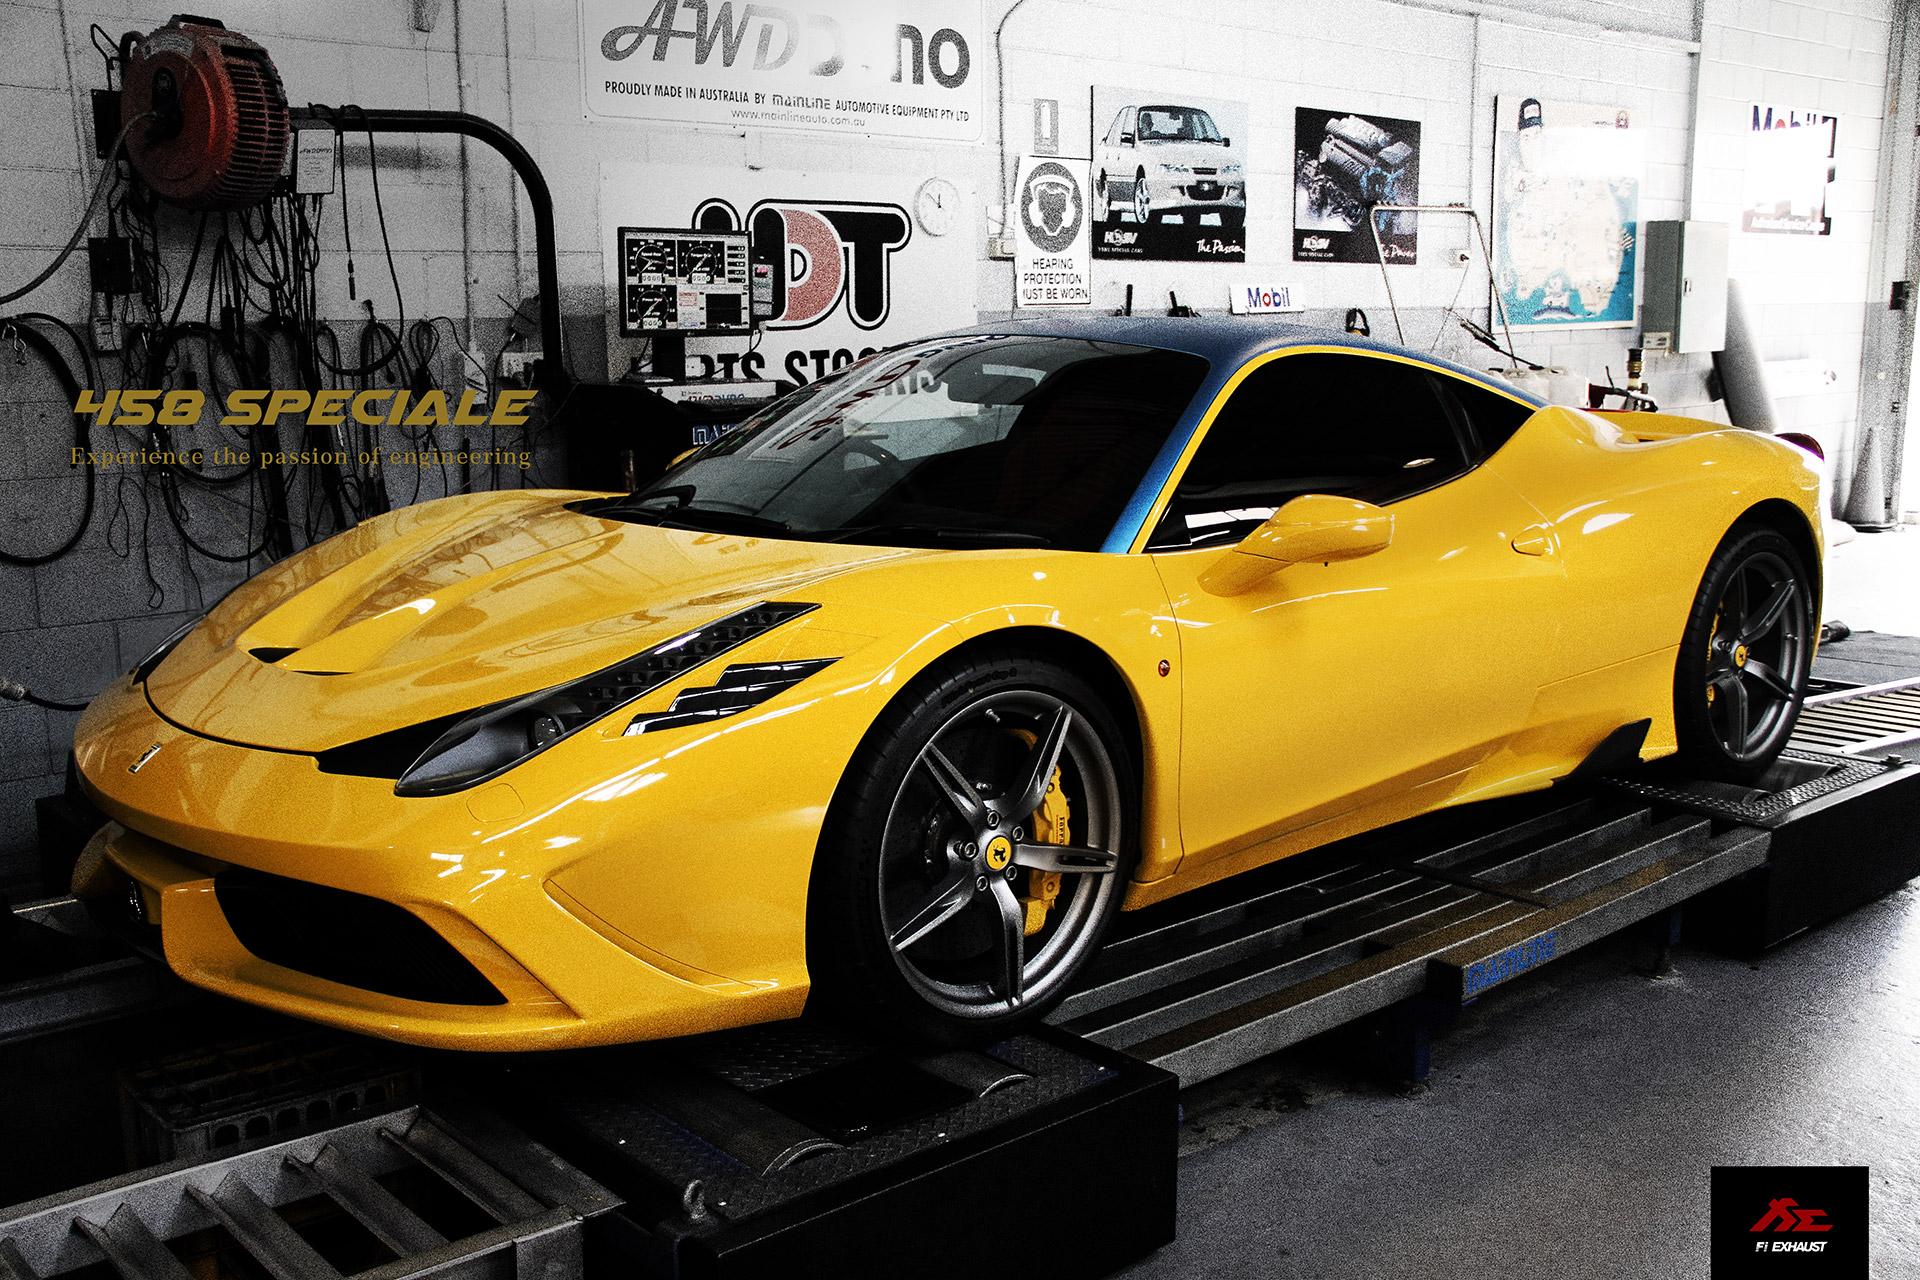 ferrari_458-Speciale_exhaust.jpg